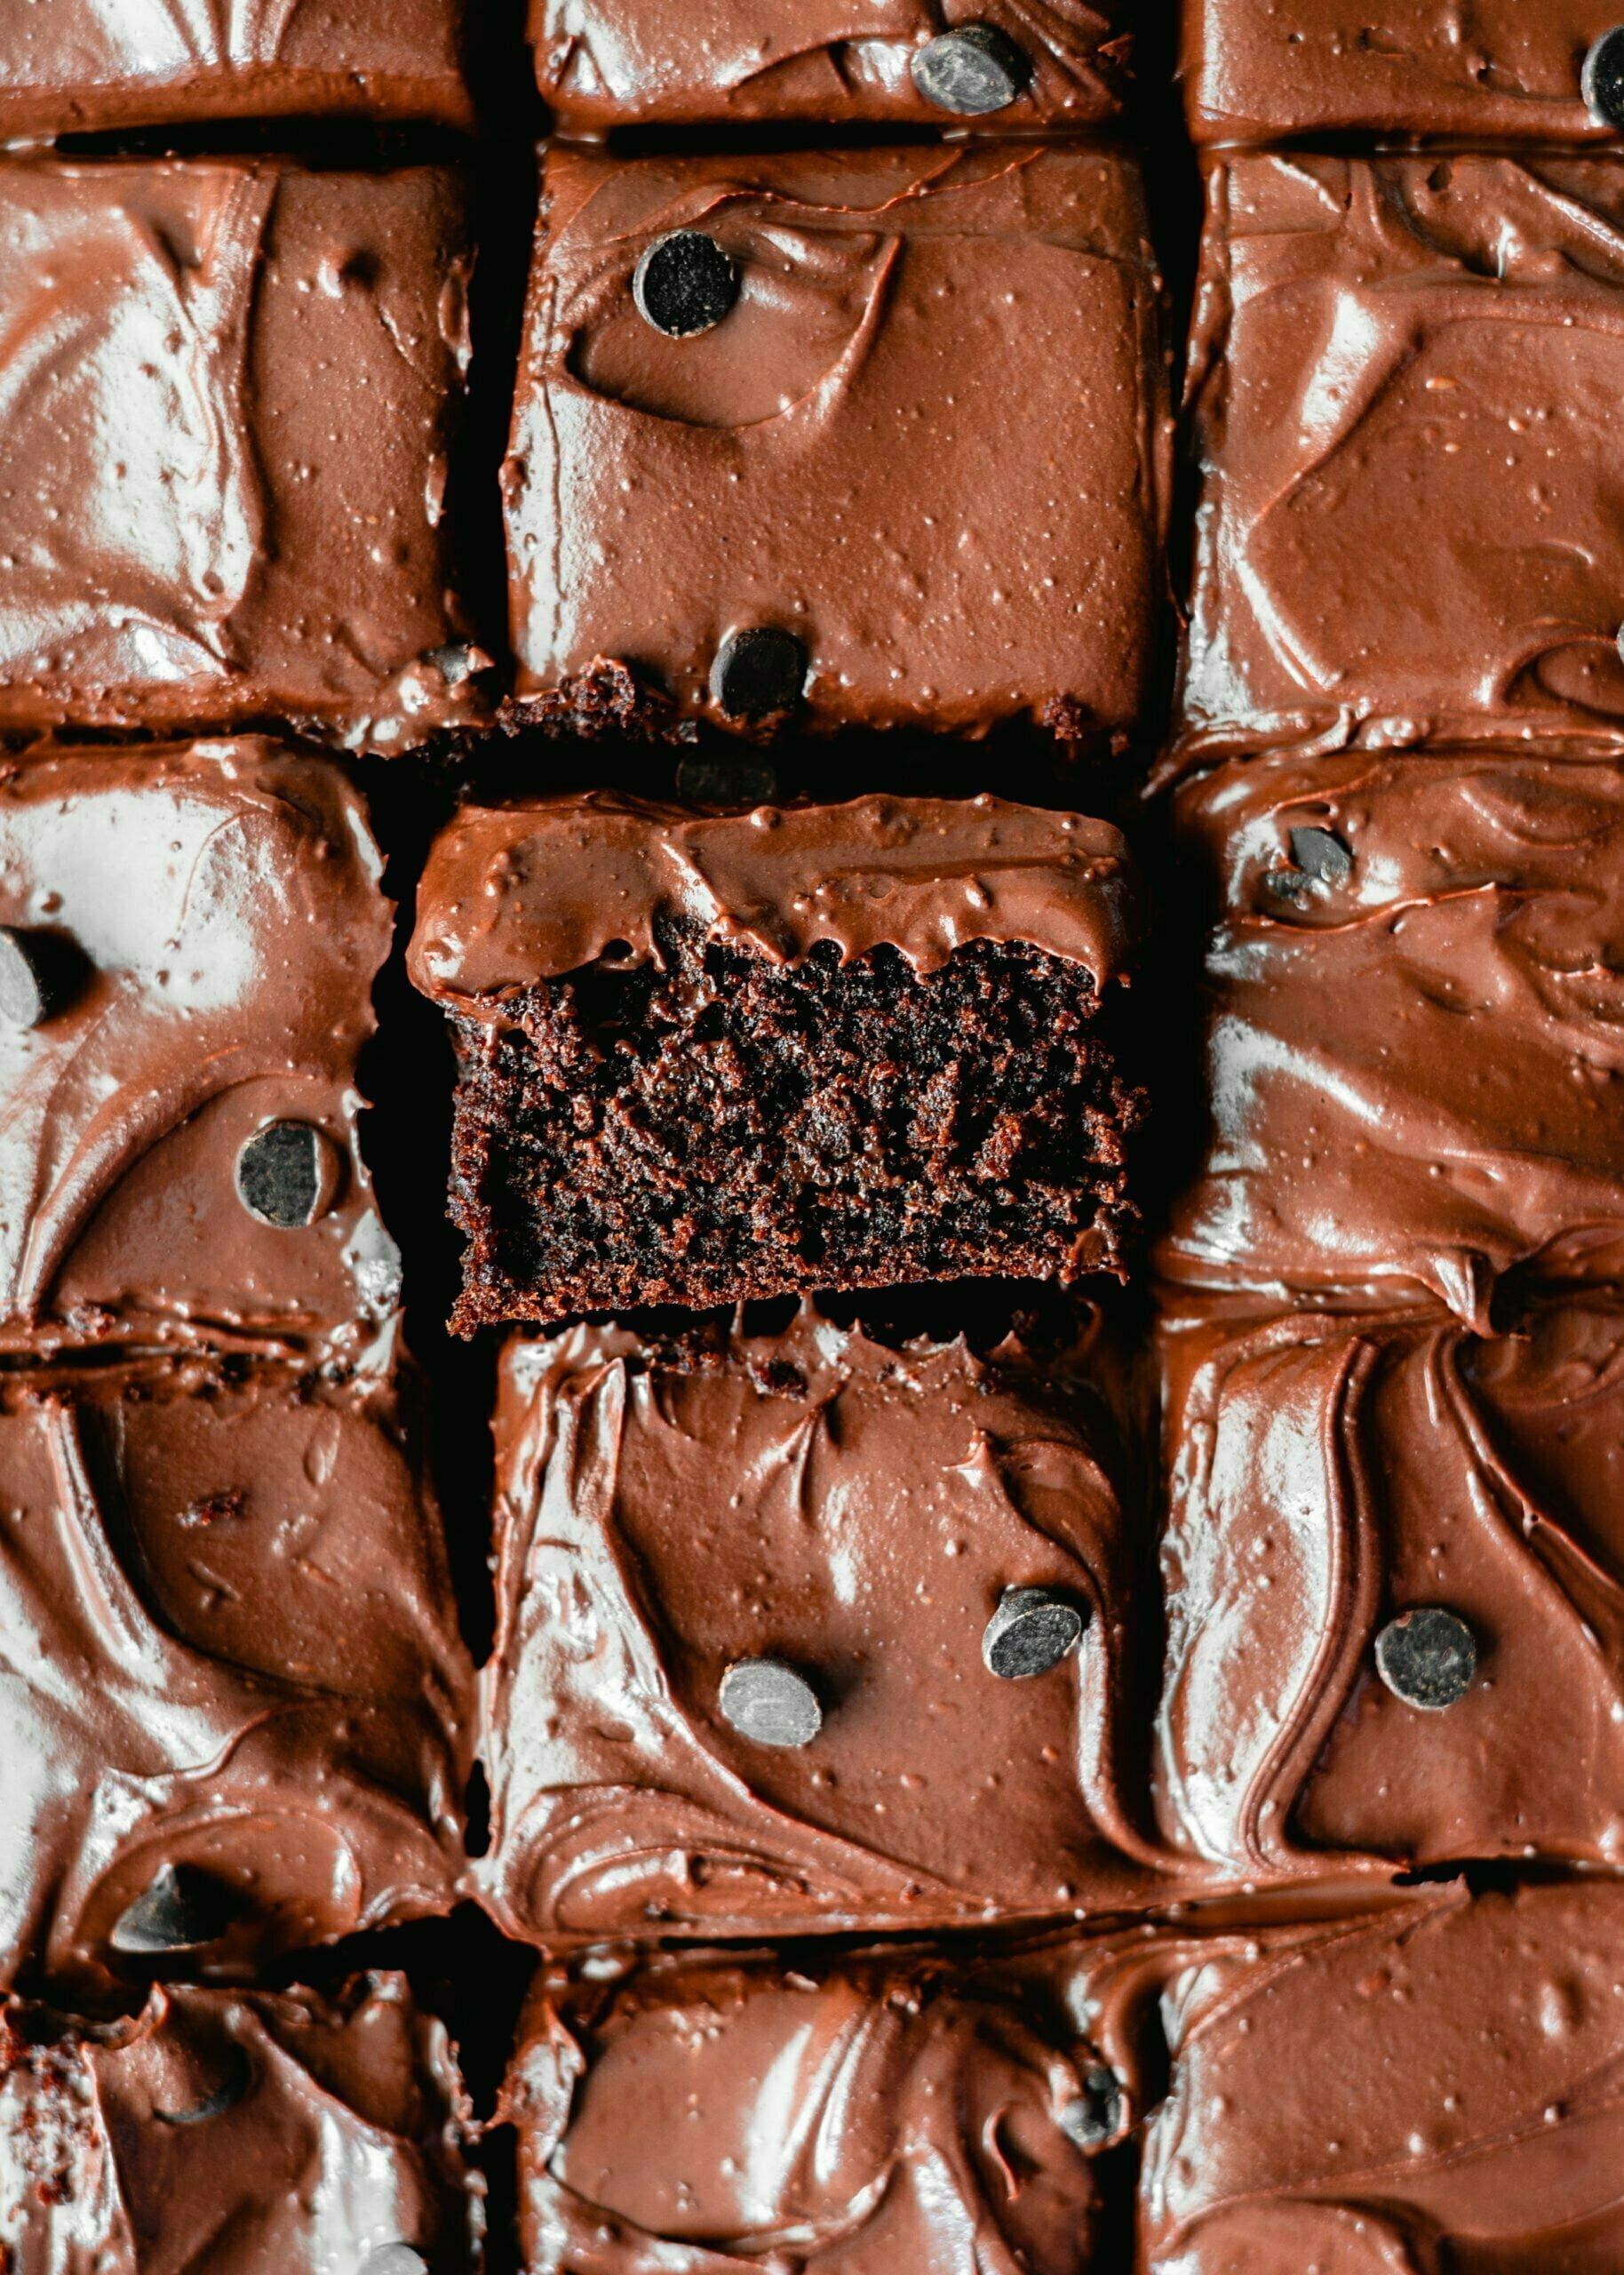 Puhasta veganska čokoladna torta s čokoladno ganache kremo